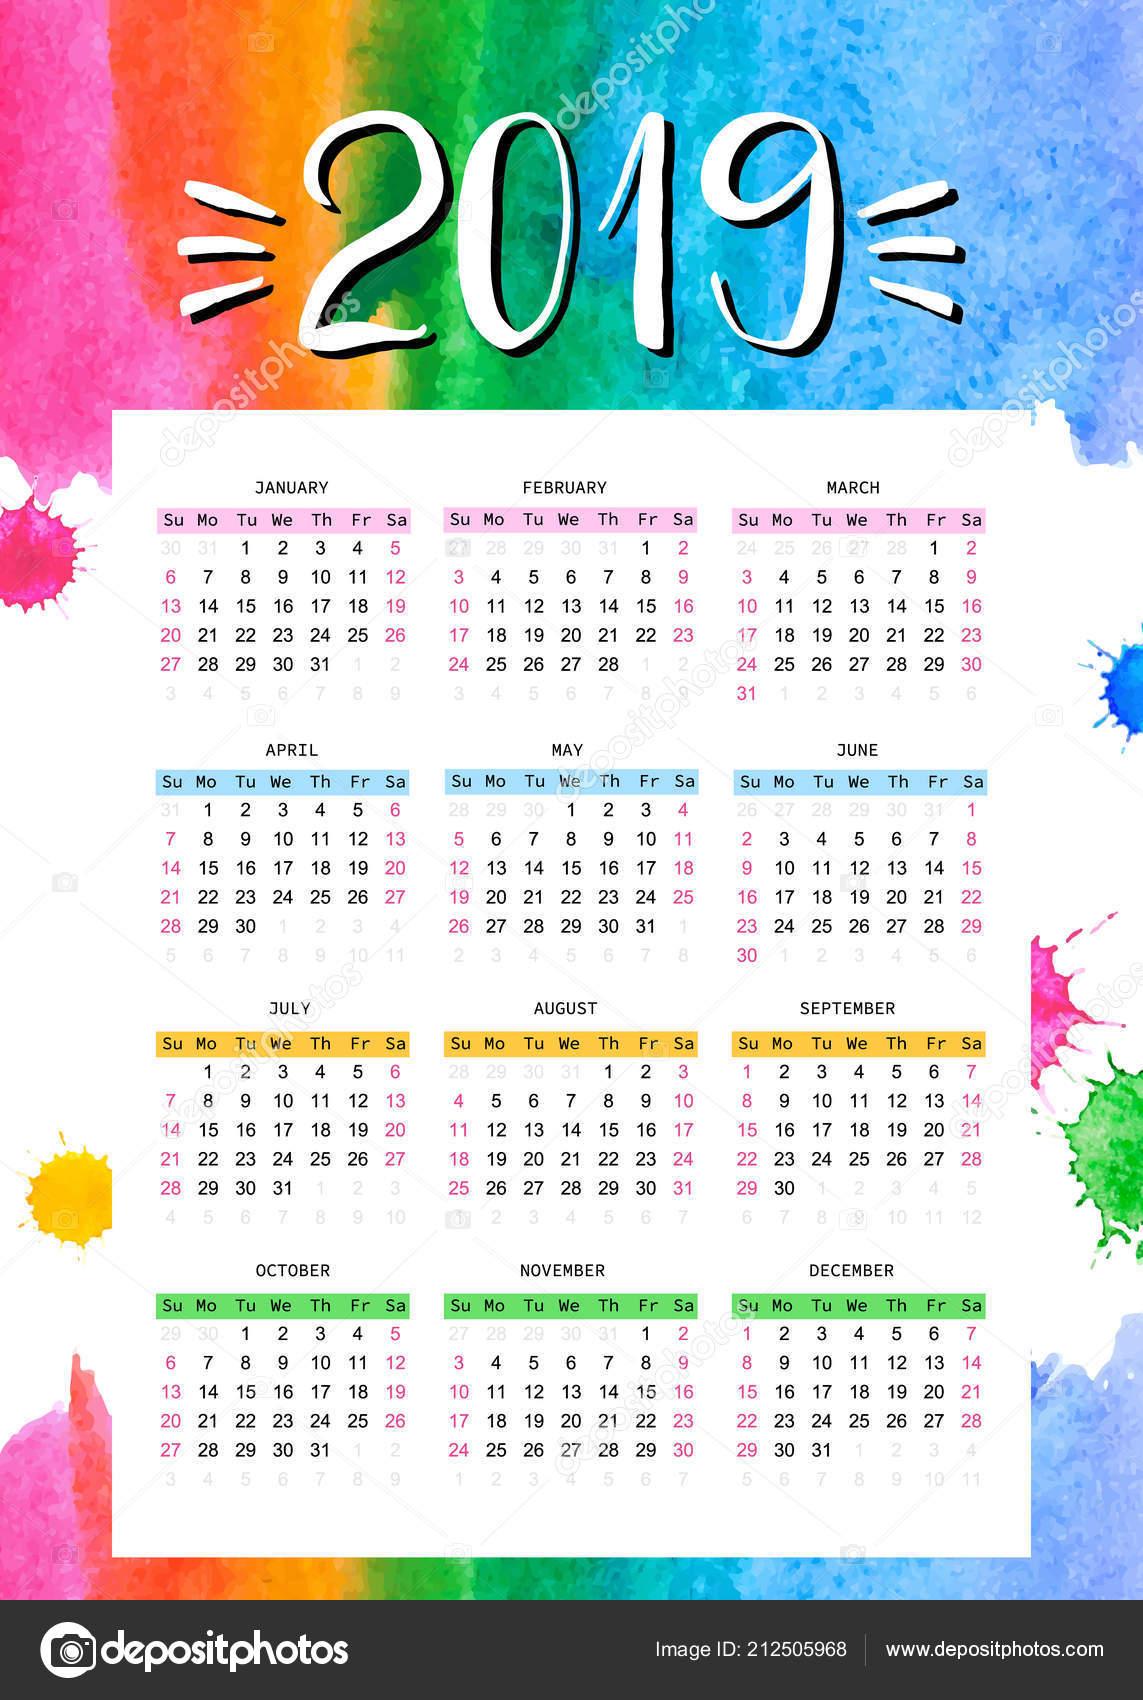 Calendario Rainbow.2019 Calendar Template Decorated Watercolor Rainbow